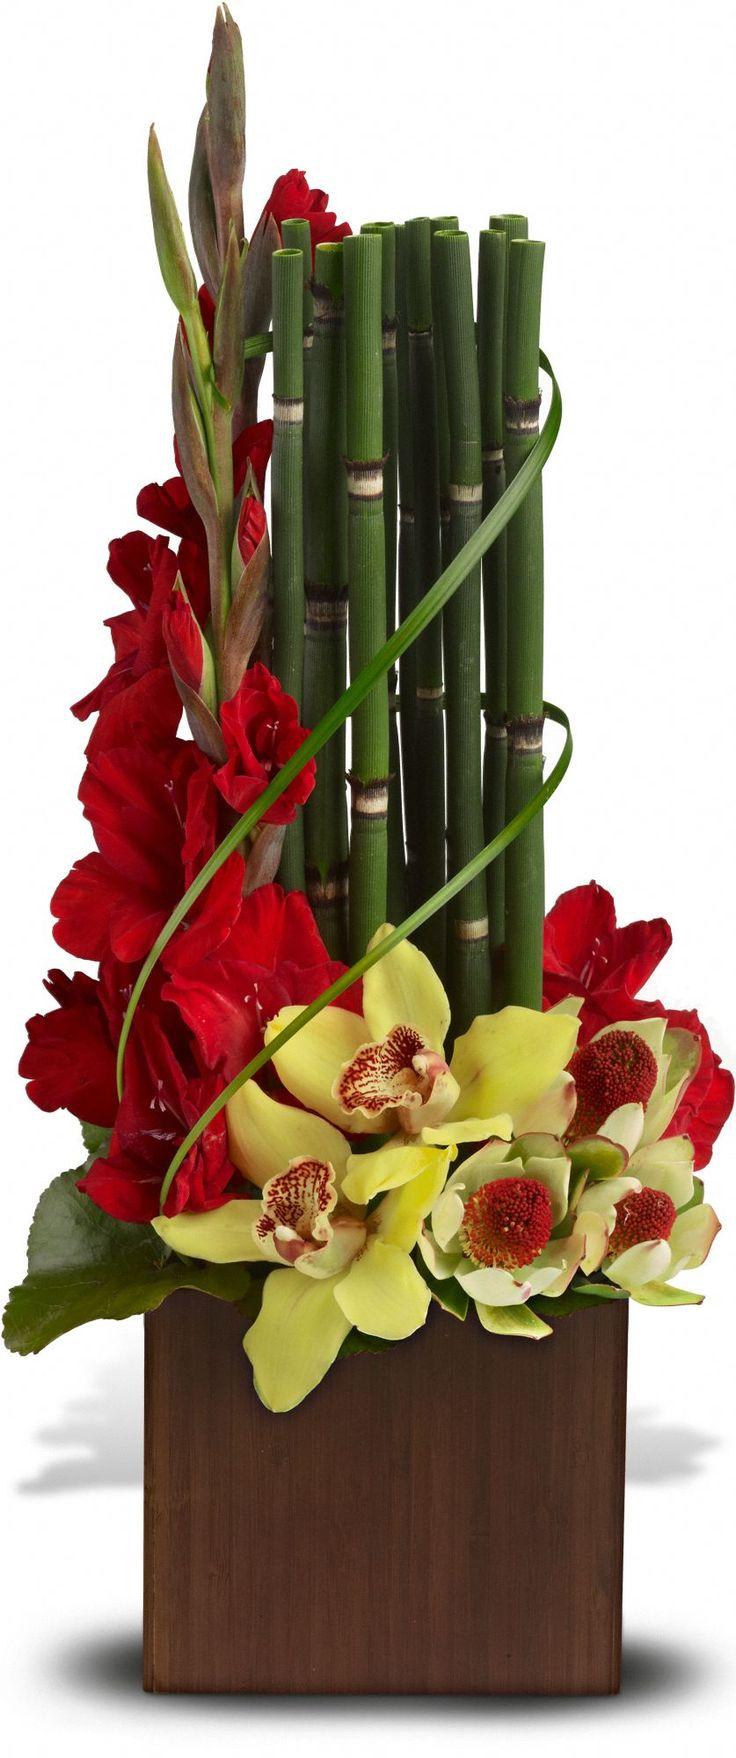 Teleflora's Fantasy Found Flowers, Teleflora's Fantasy Found Flower Bouquet - Teleflora.com